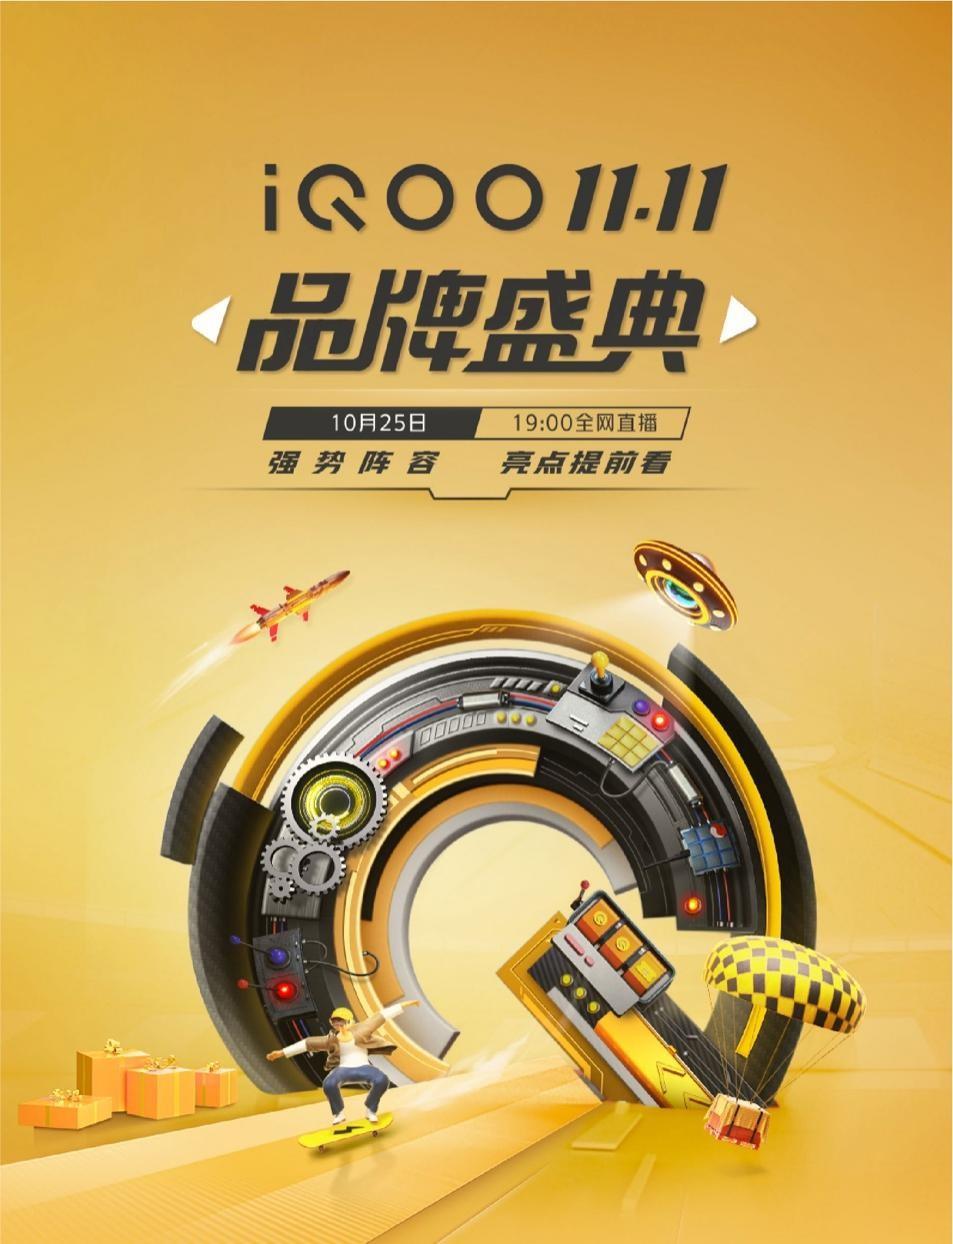 iQOO 11.11品牌盛典强悍来袭:人气新品iQOO Z5x火热预售中